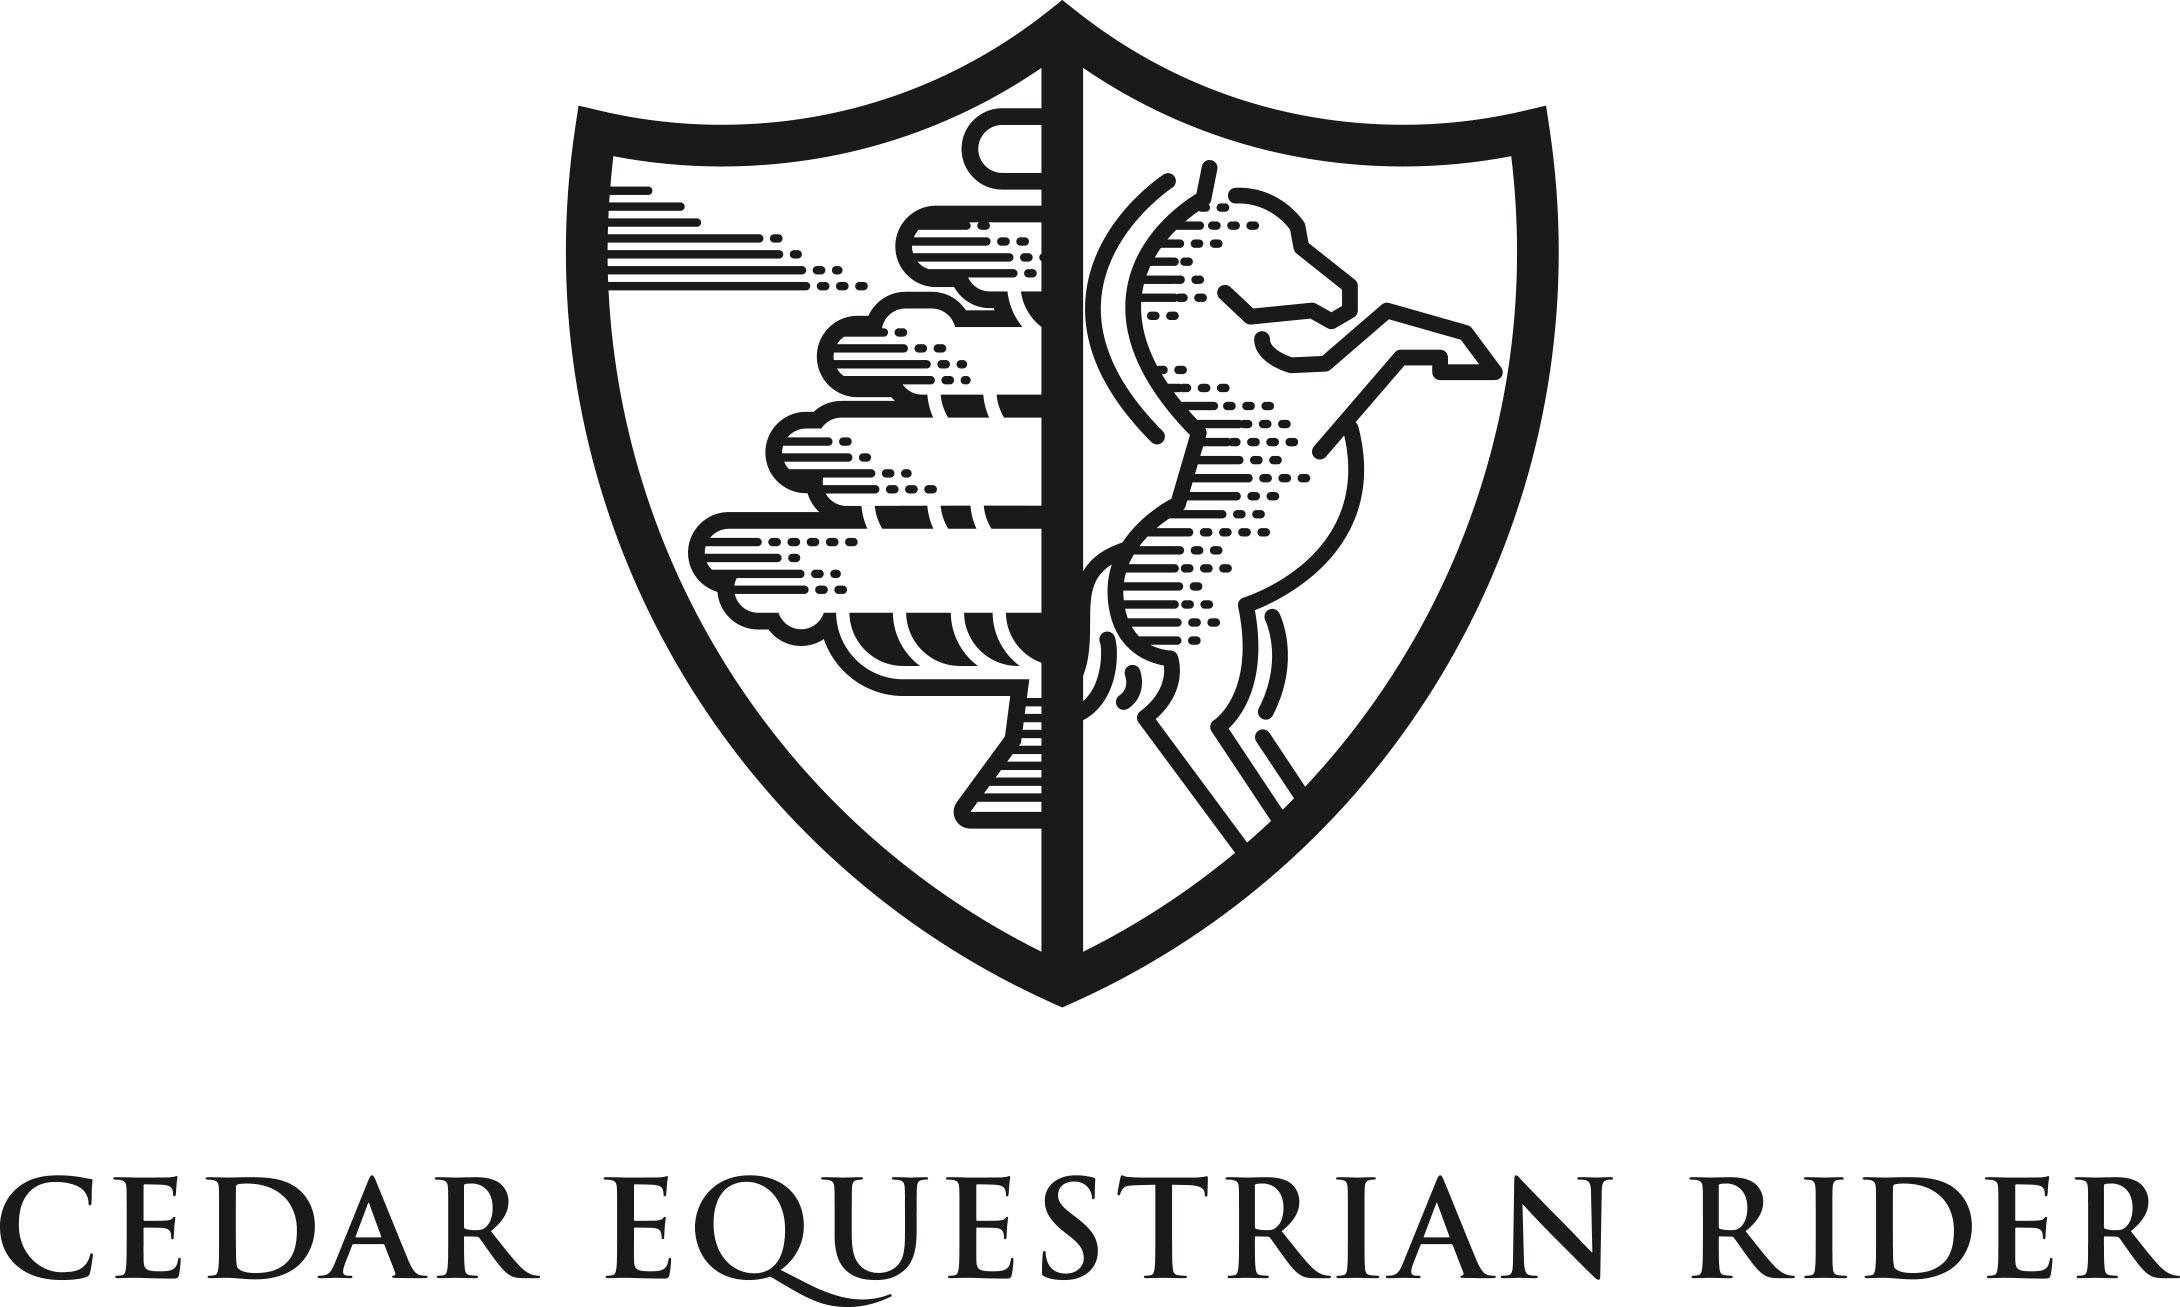 Cedar Equestrian Rider